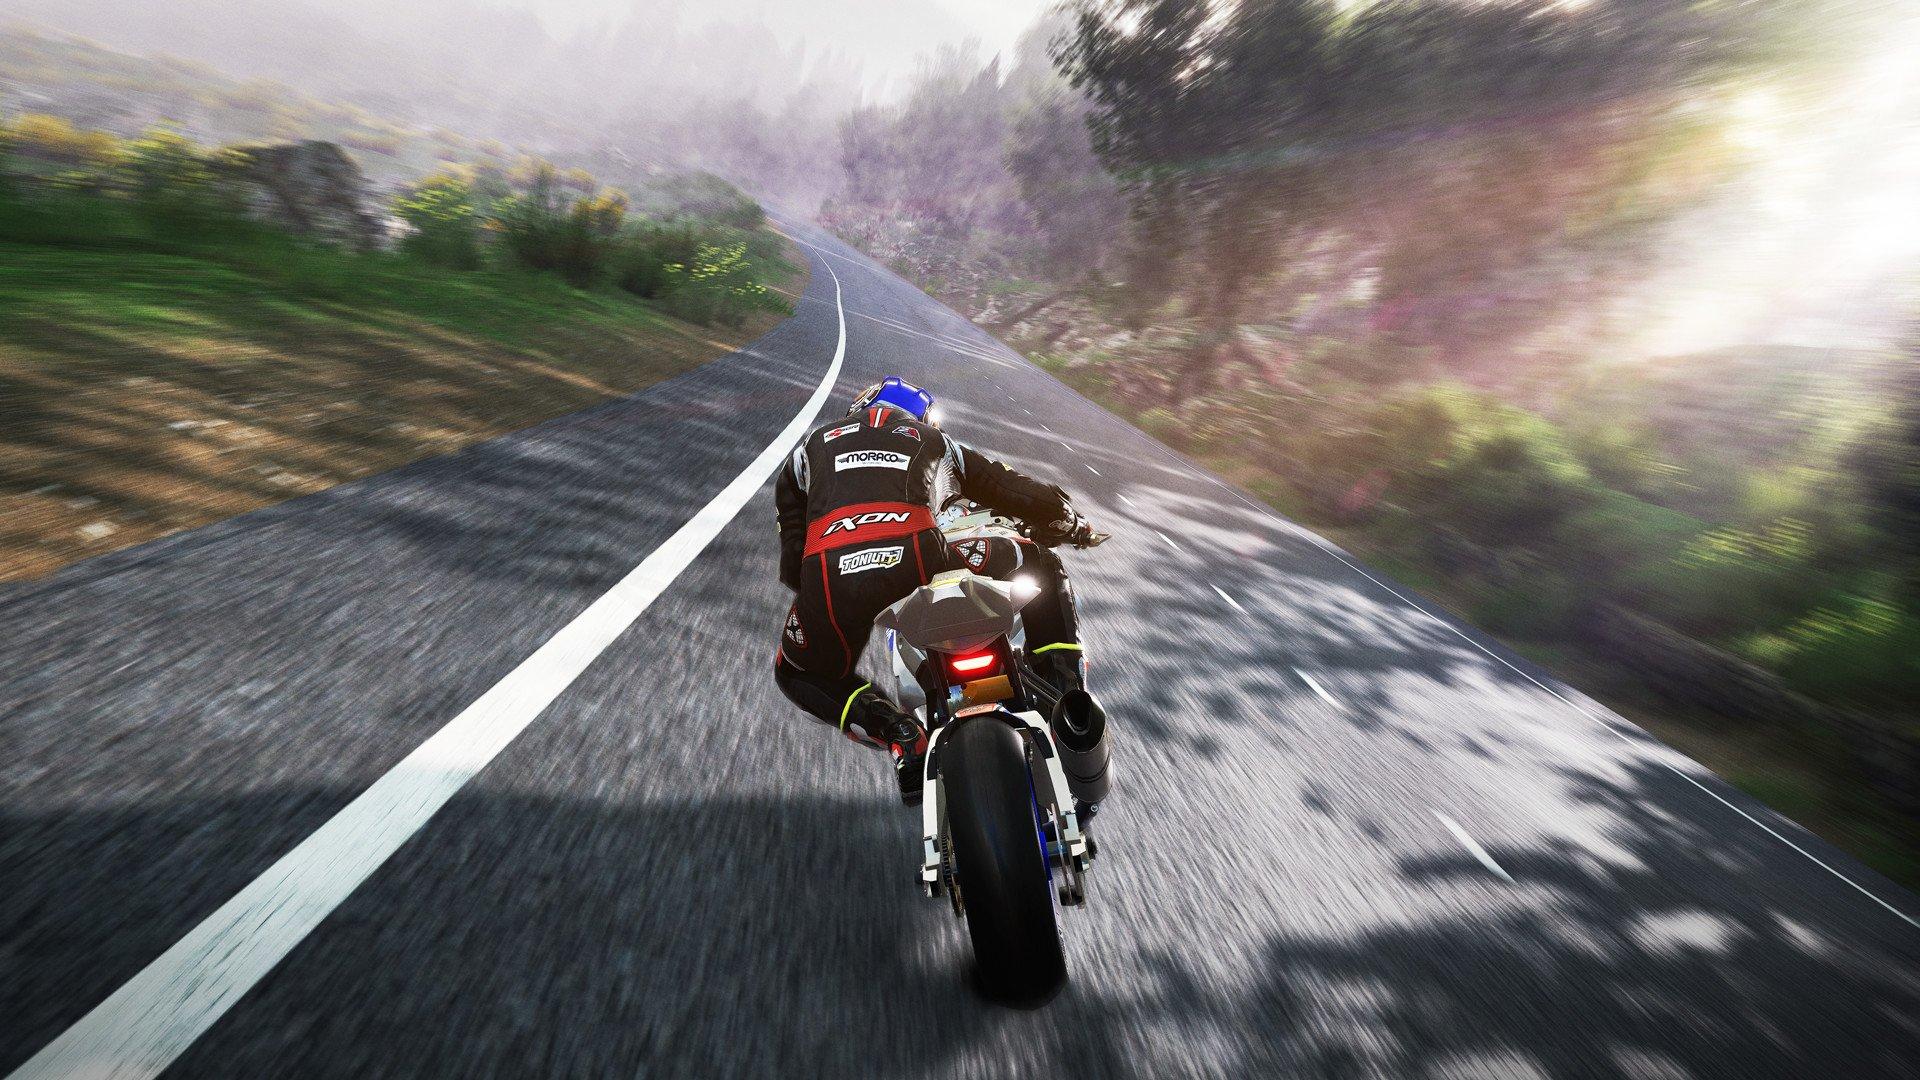 Скриншот к игре TT Isle of Man Ride on the Edge 2 (2020) скачать торрент RePack